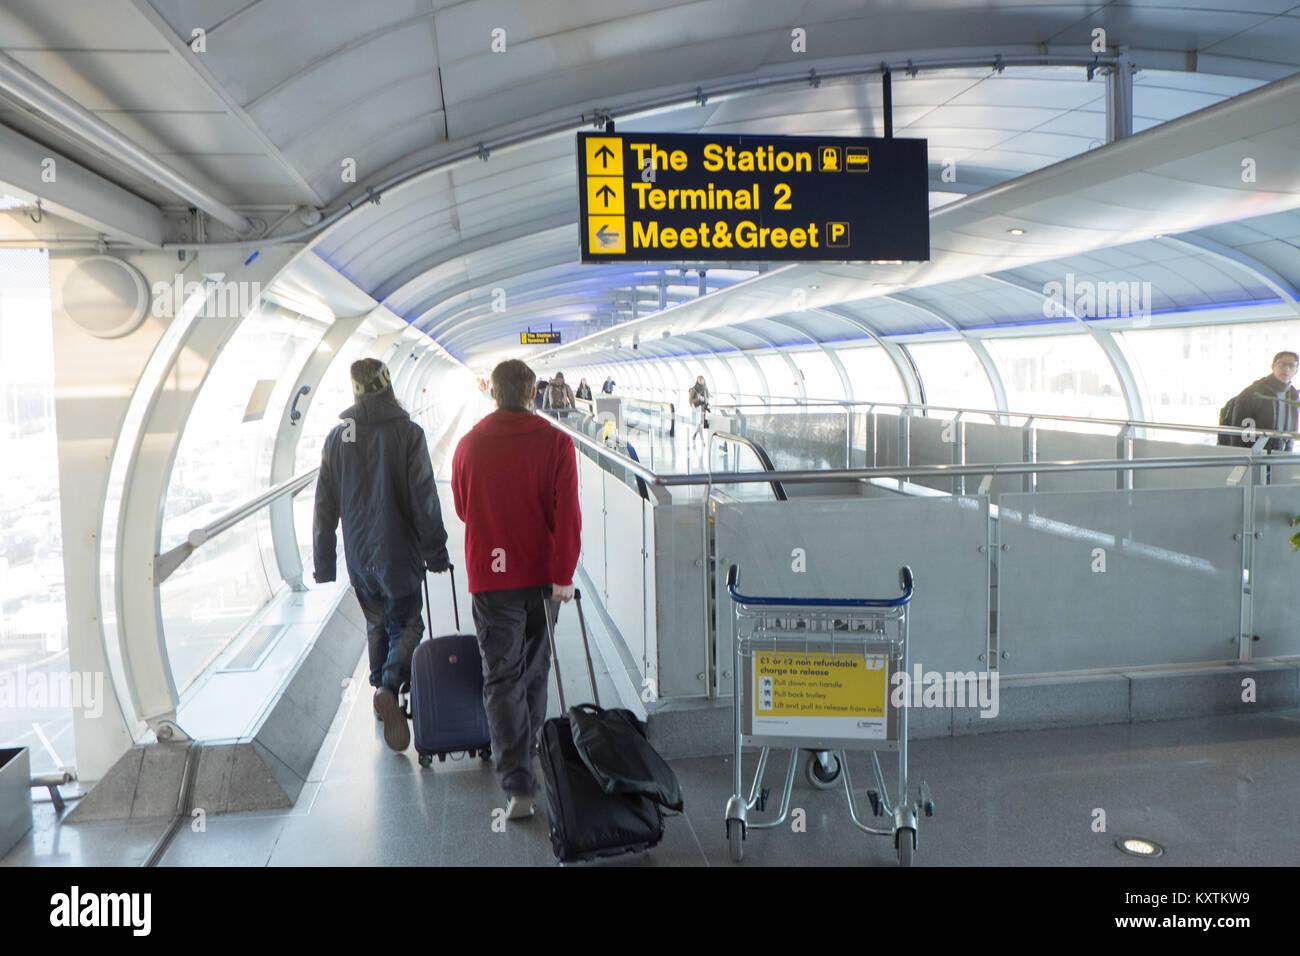 Passengerpassengerstravellingonconveyorbeltlinktransit passengerpassengerstravellingonconveyorbeltlinktransitbetween terminal buildingandtrainbusterminusterminalmanchesterairport england m4hsunfo